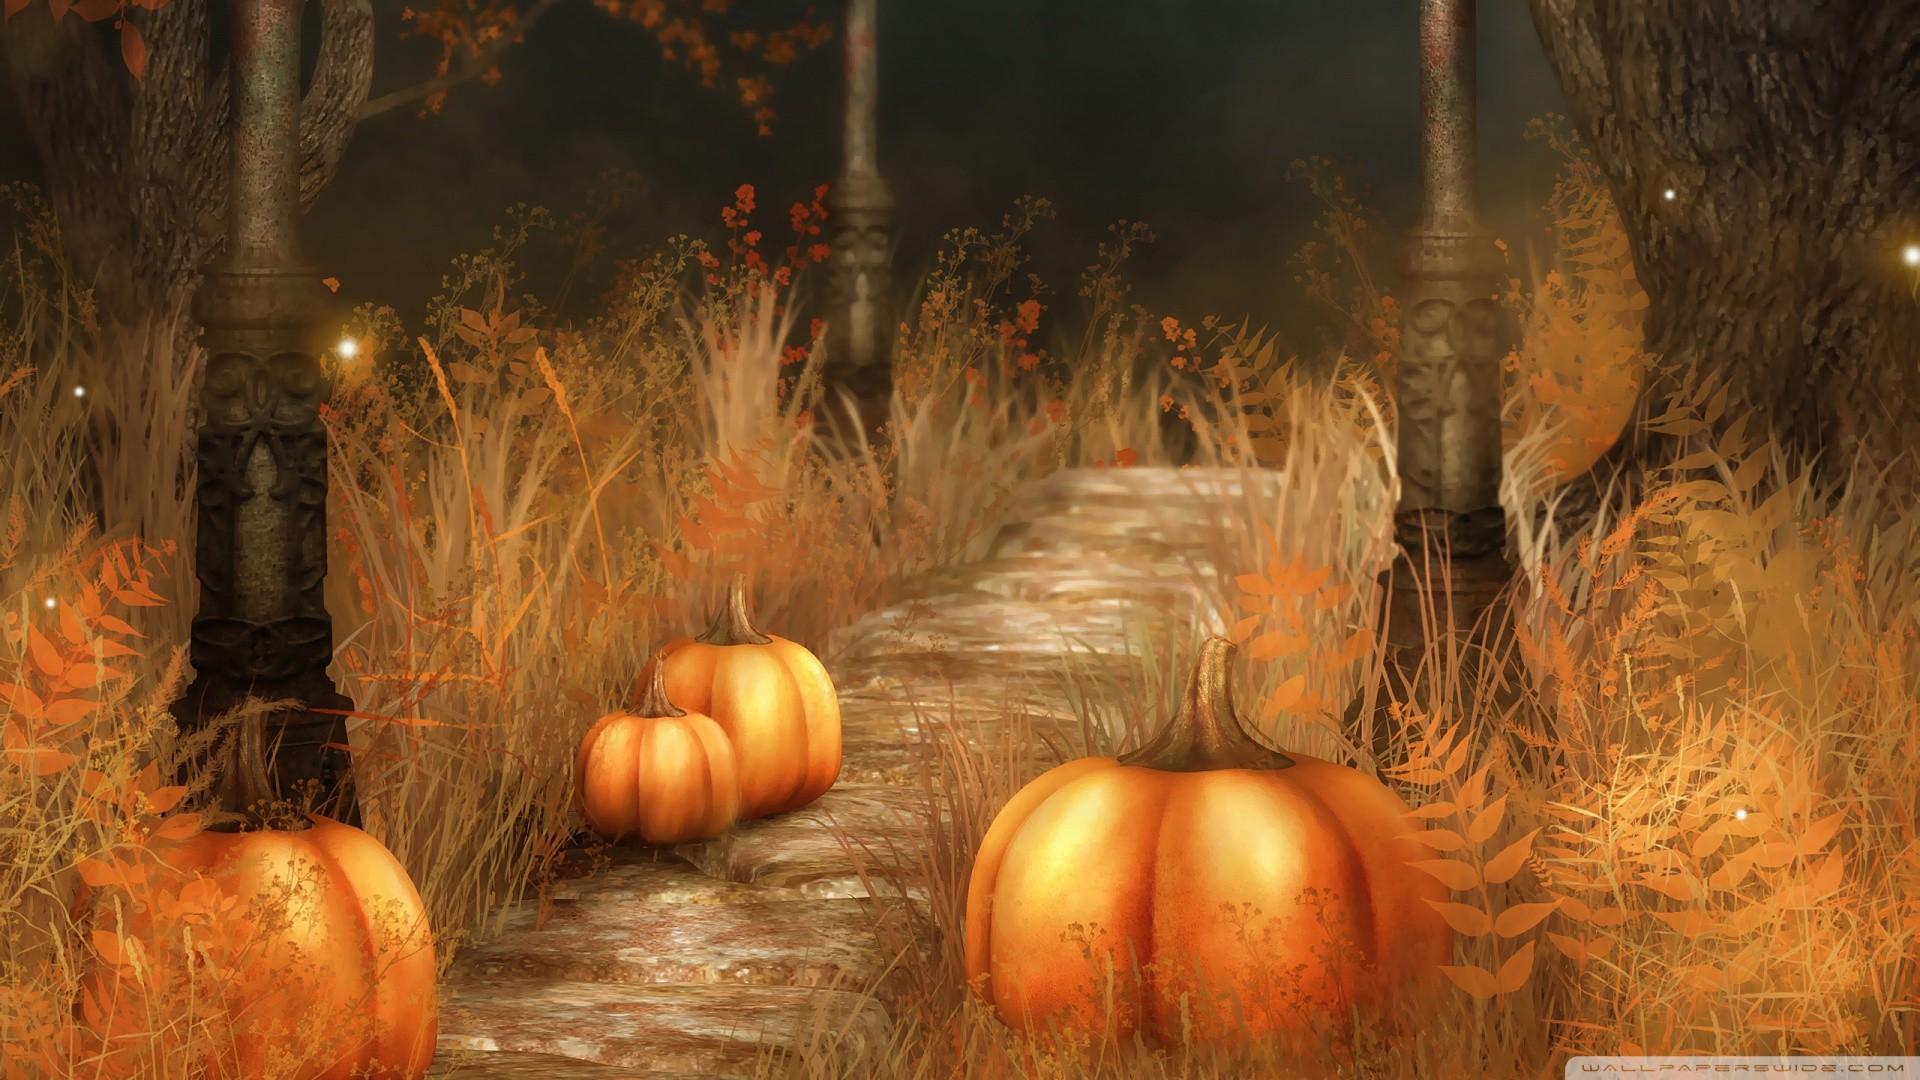 3072x2048 Pretty Pumpkin Desktop Wallpaper